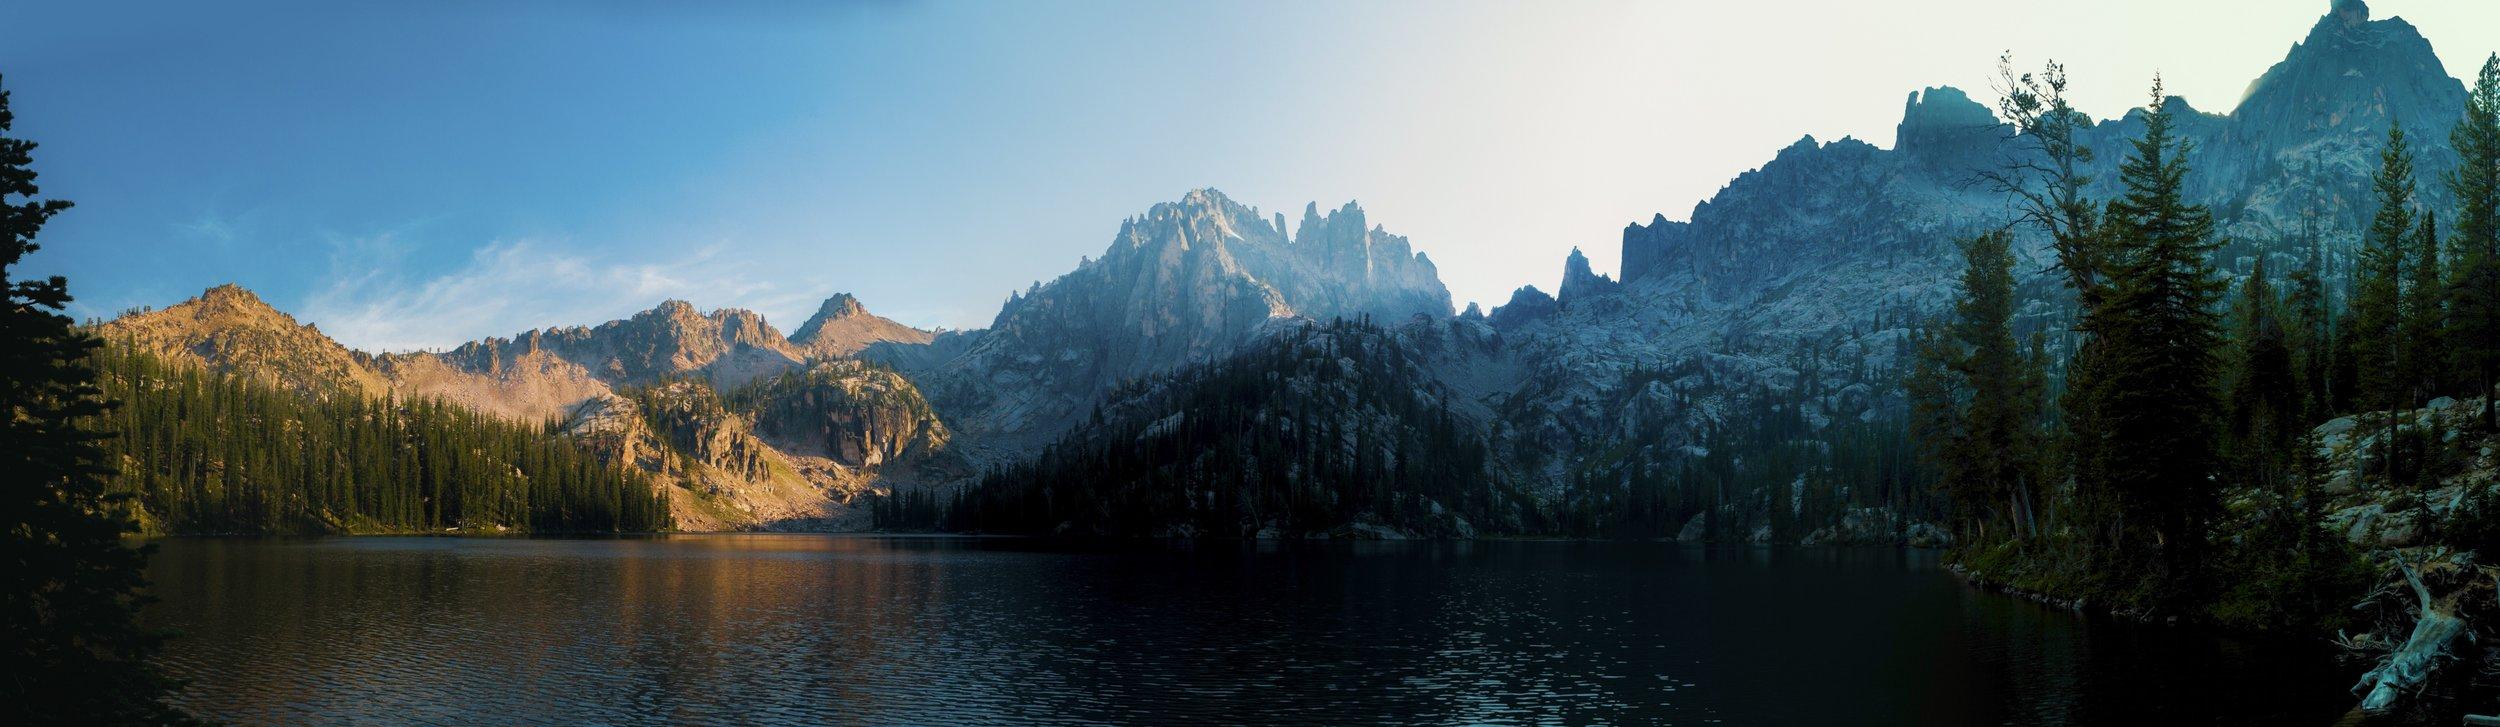 IMG_6423-Panorama2-2.jpg